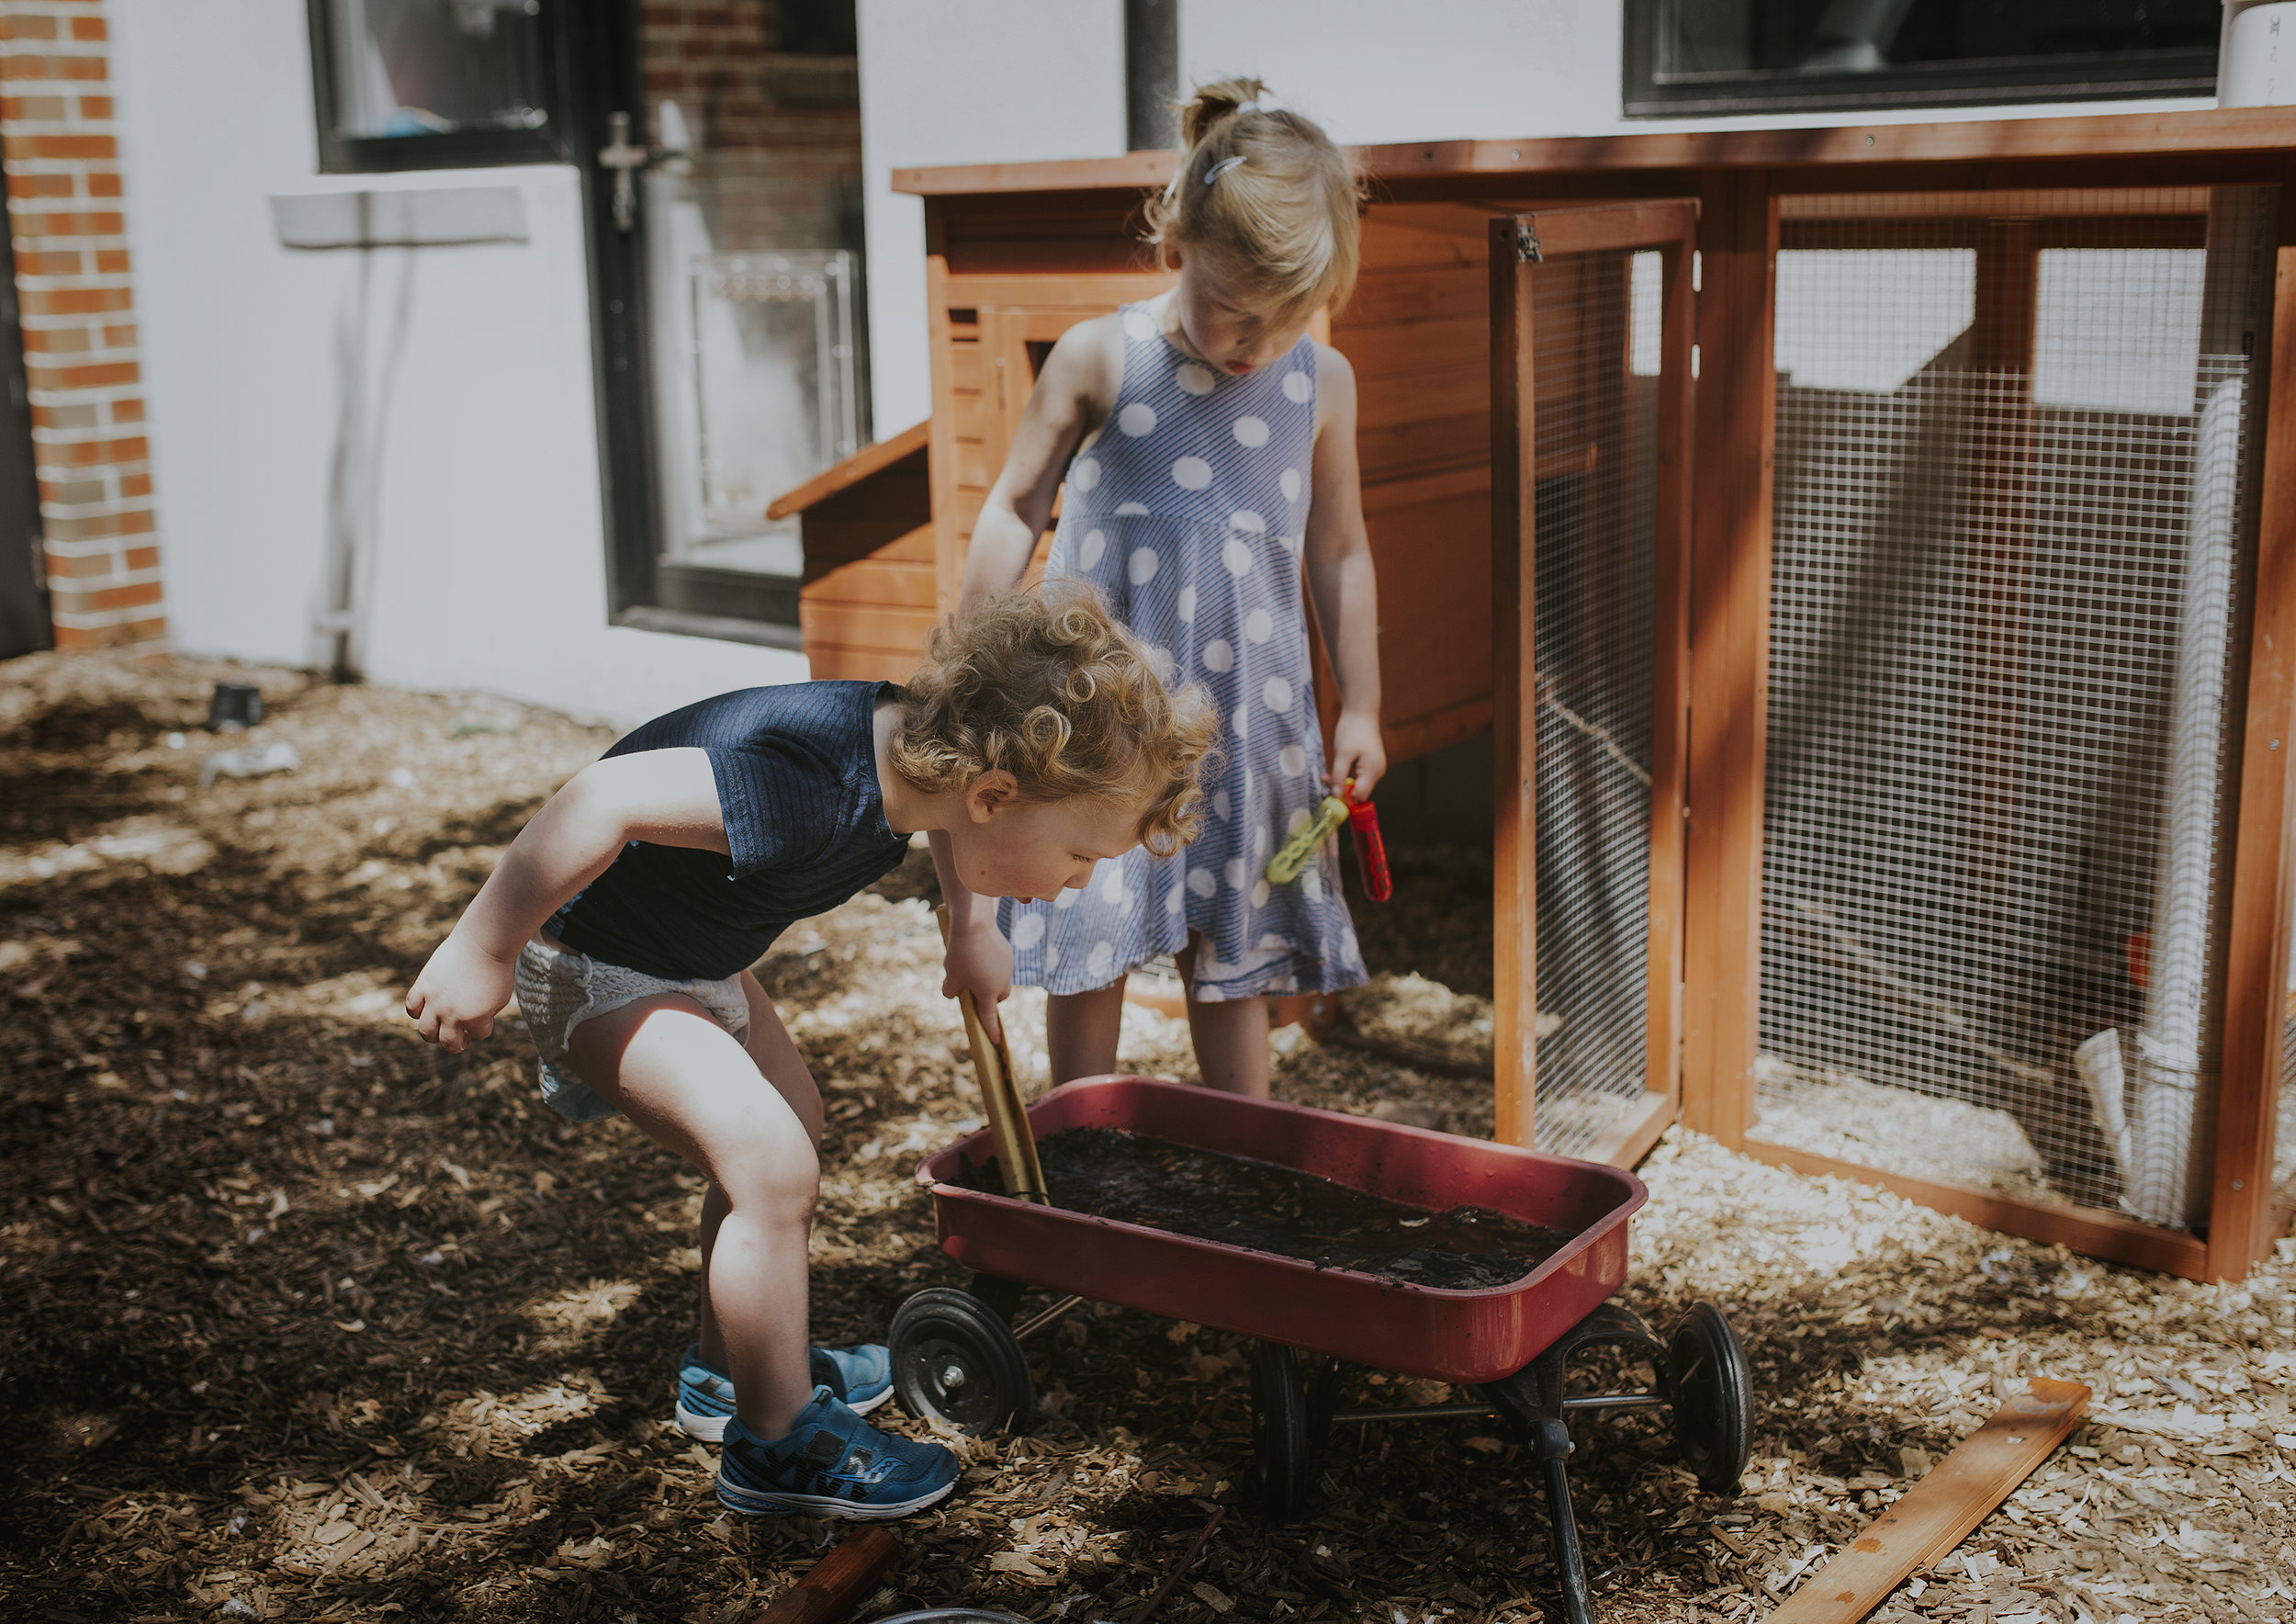 Children making mud pies in their backyard